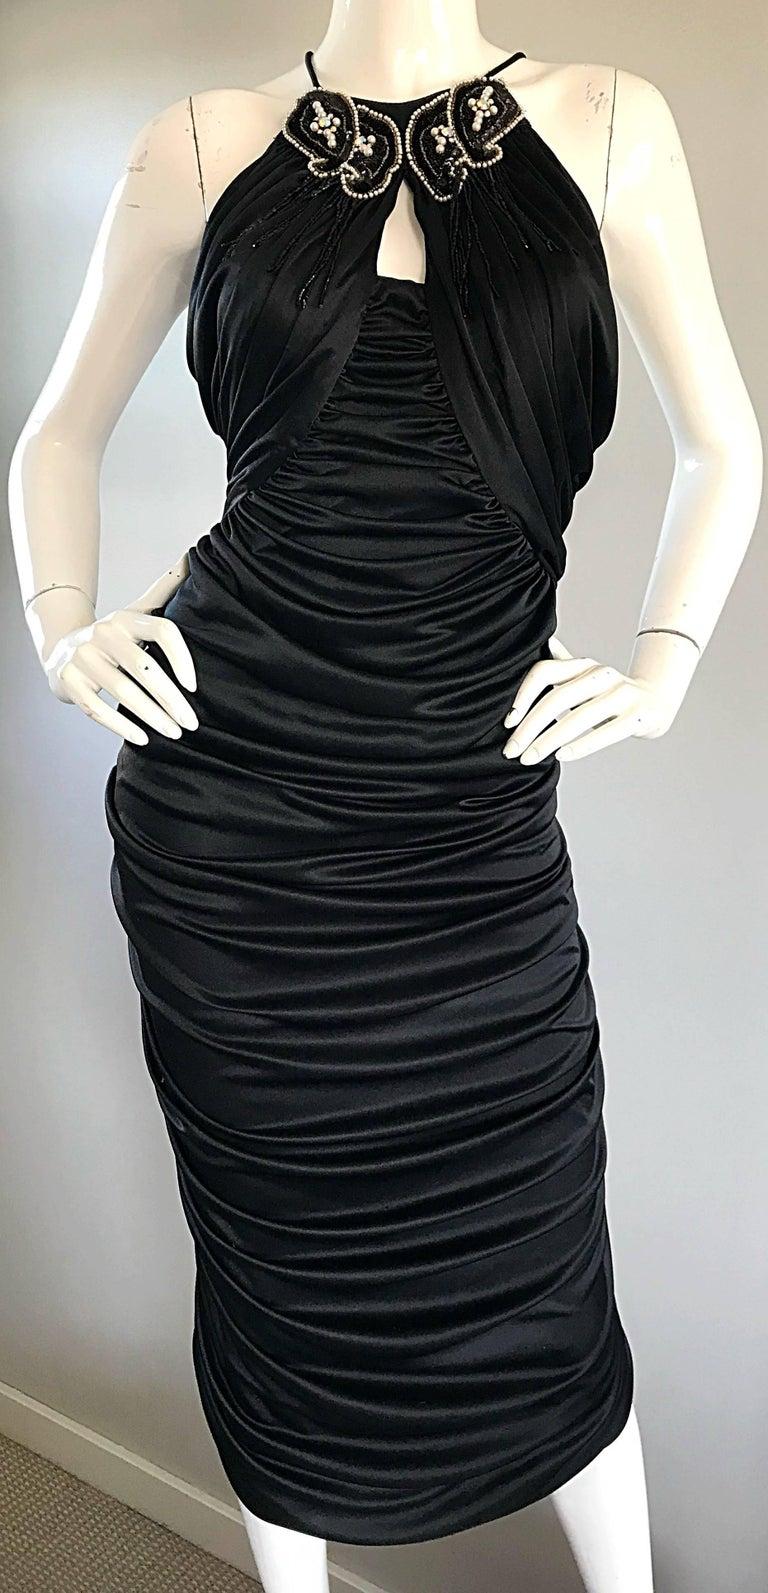 Women's 1970s Vintage Samir Black Beaded + Pearl + Rhinestone Sexy Ruched 70s Dress